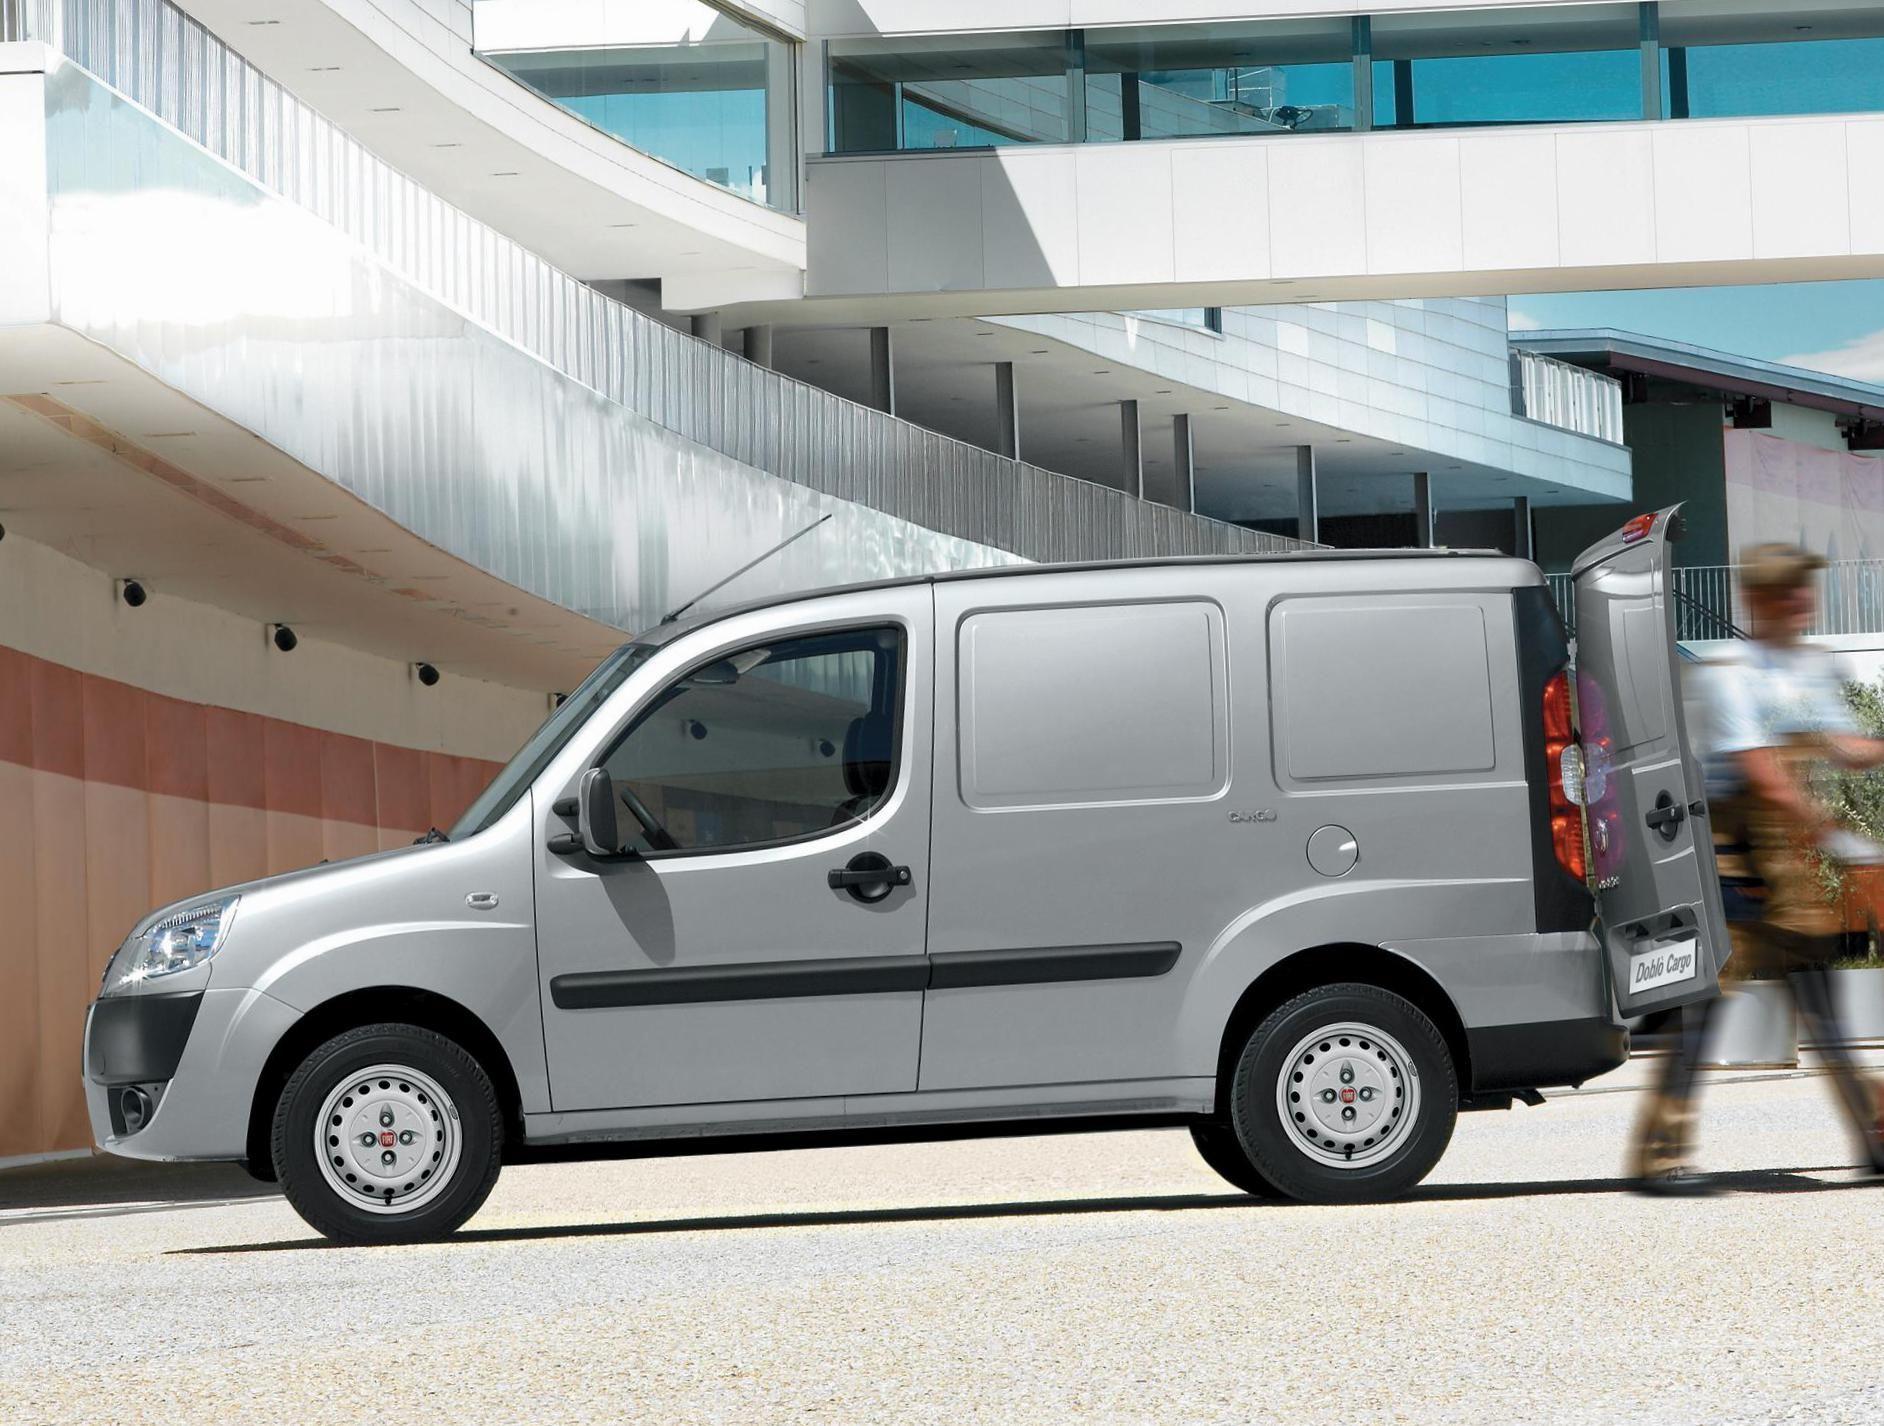 Fiat Doblo Cargo Specification Http Autotras Com Auto